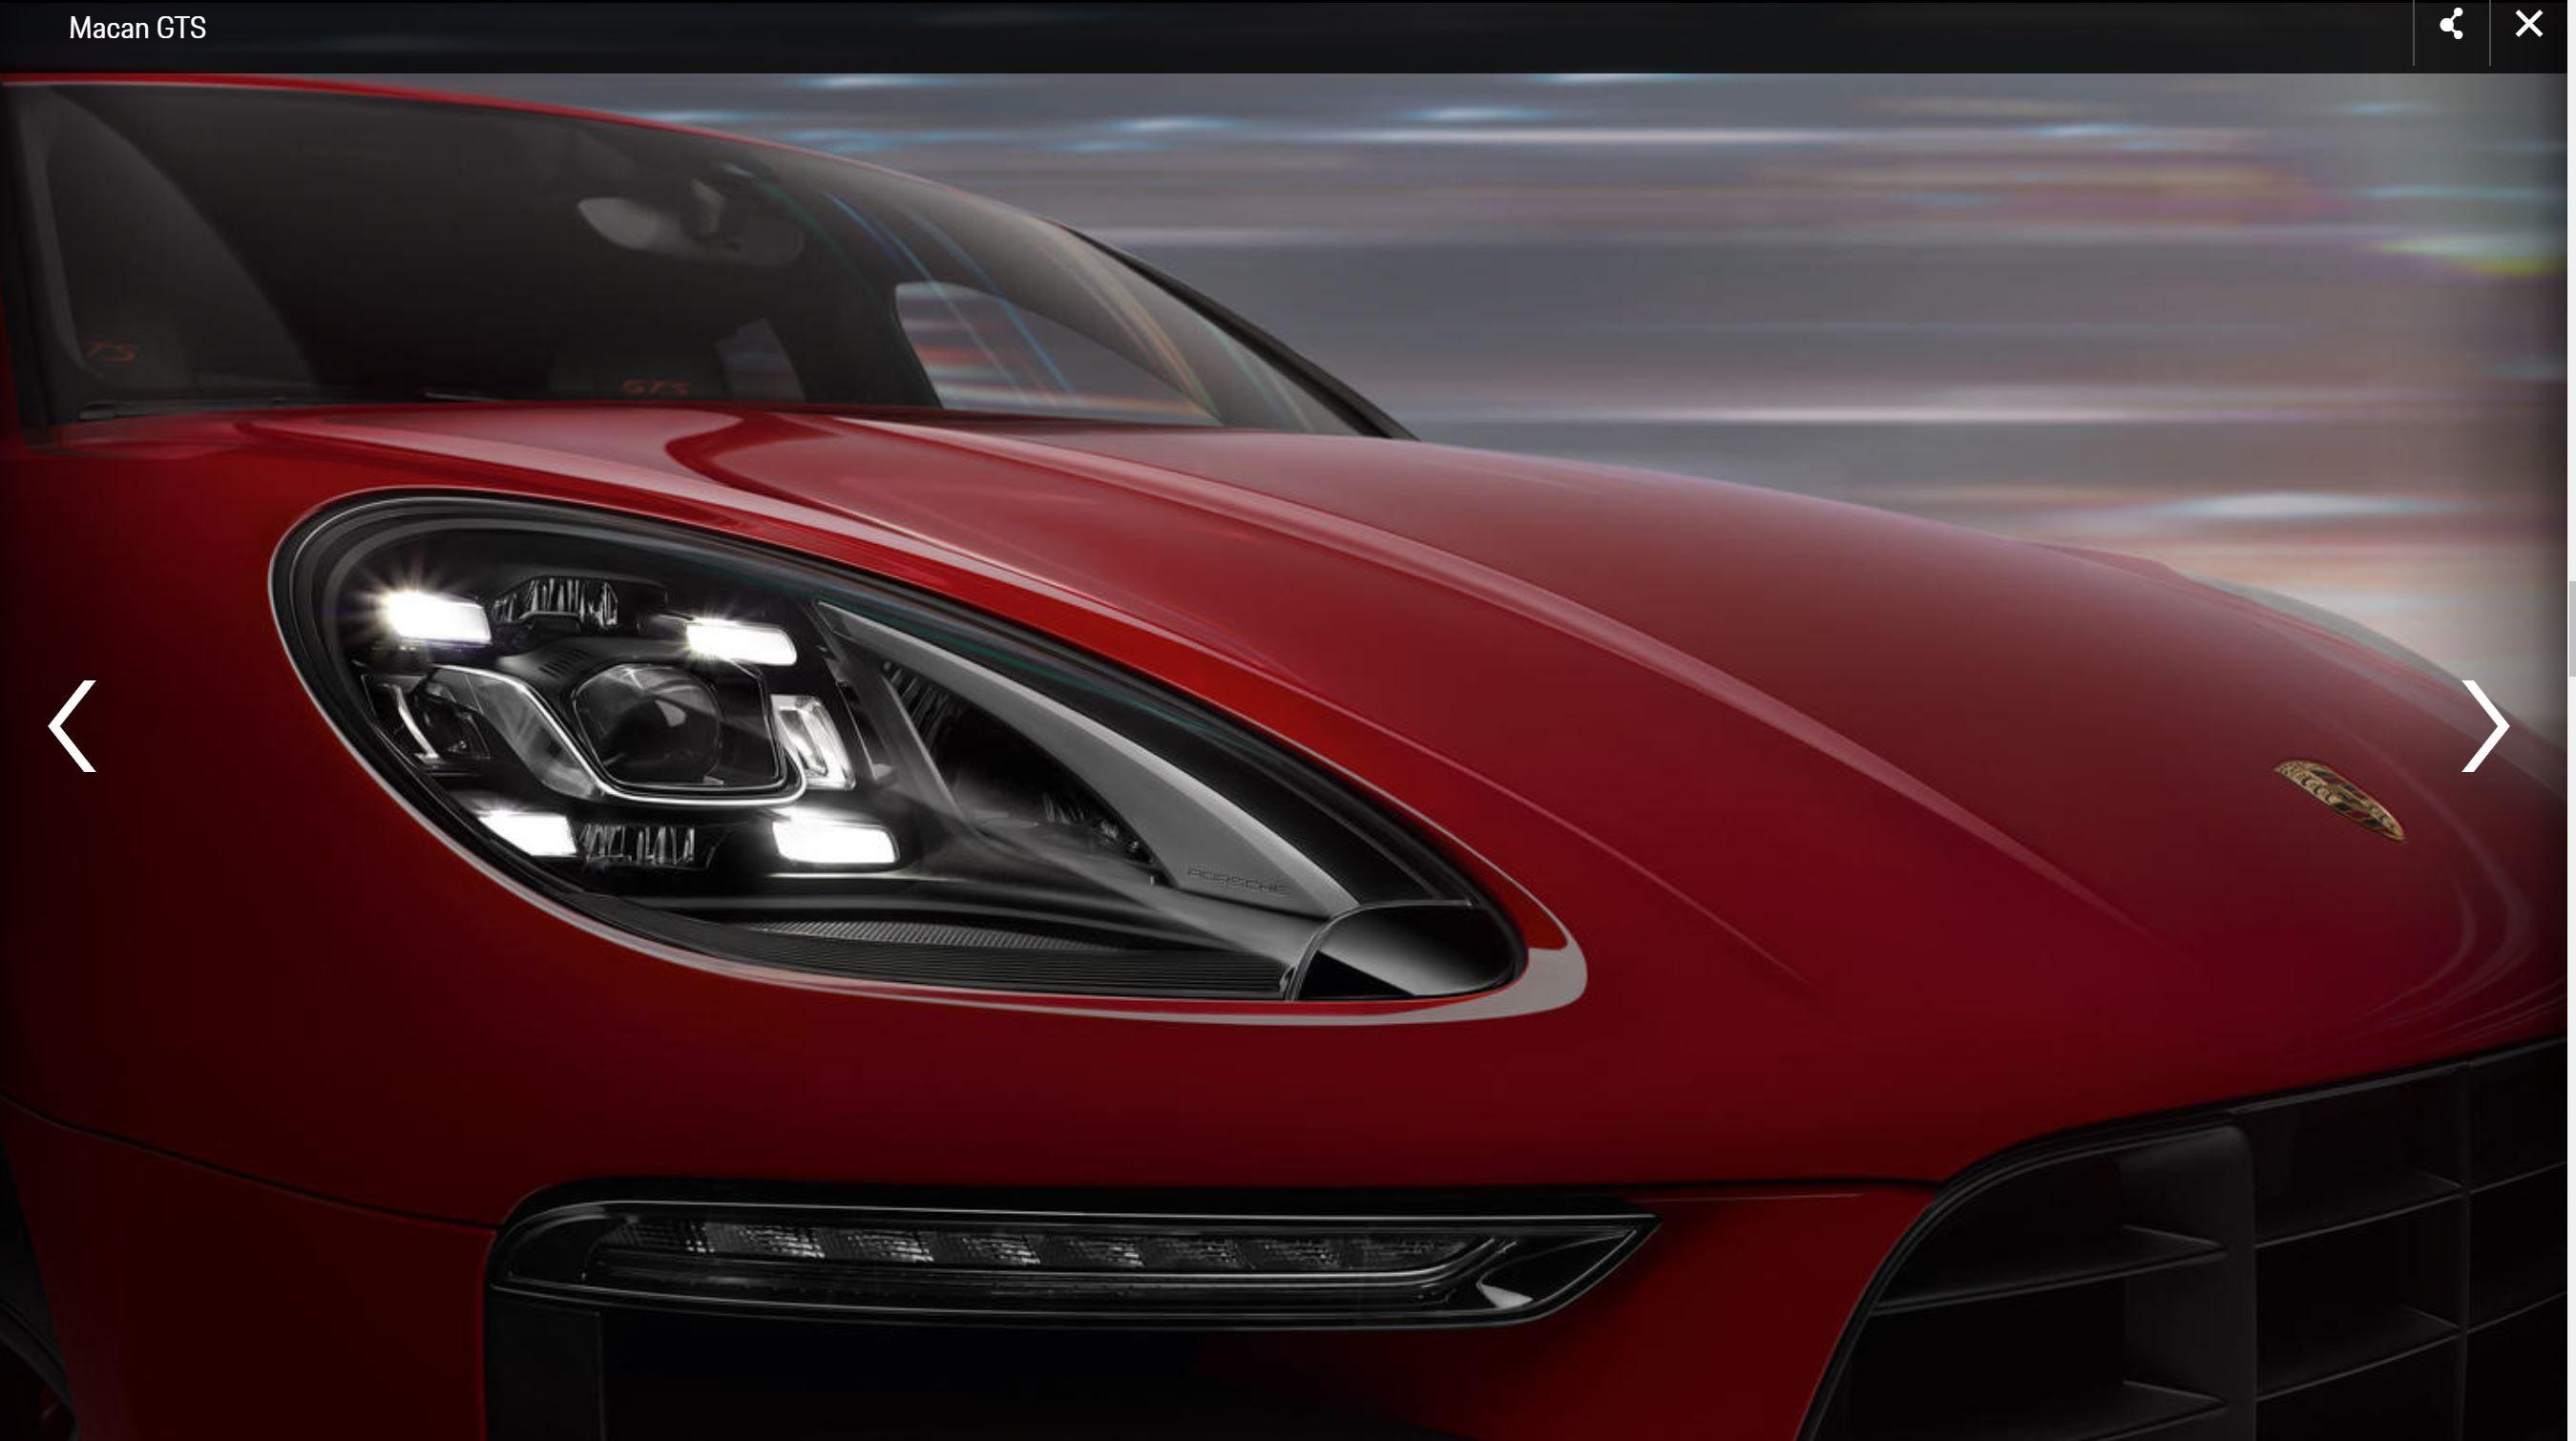 Macan GTS LED Headlights (mit Bildern)